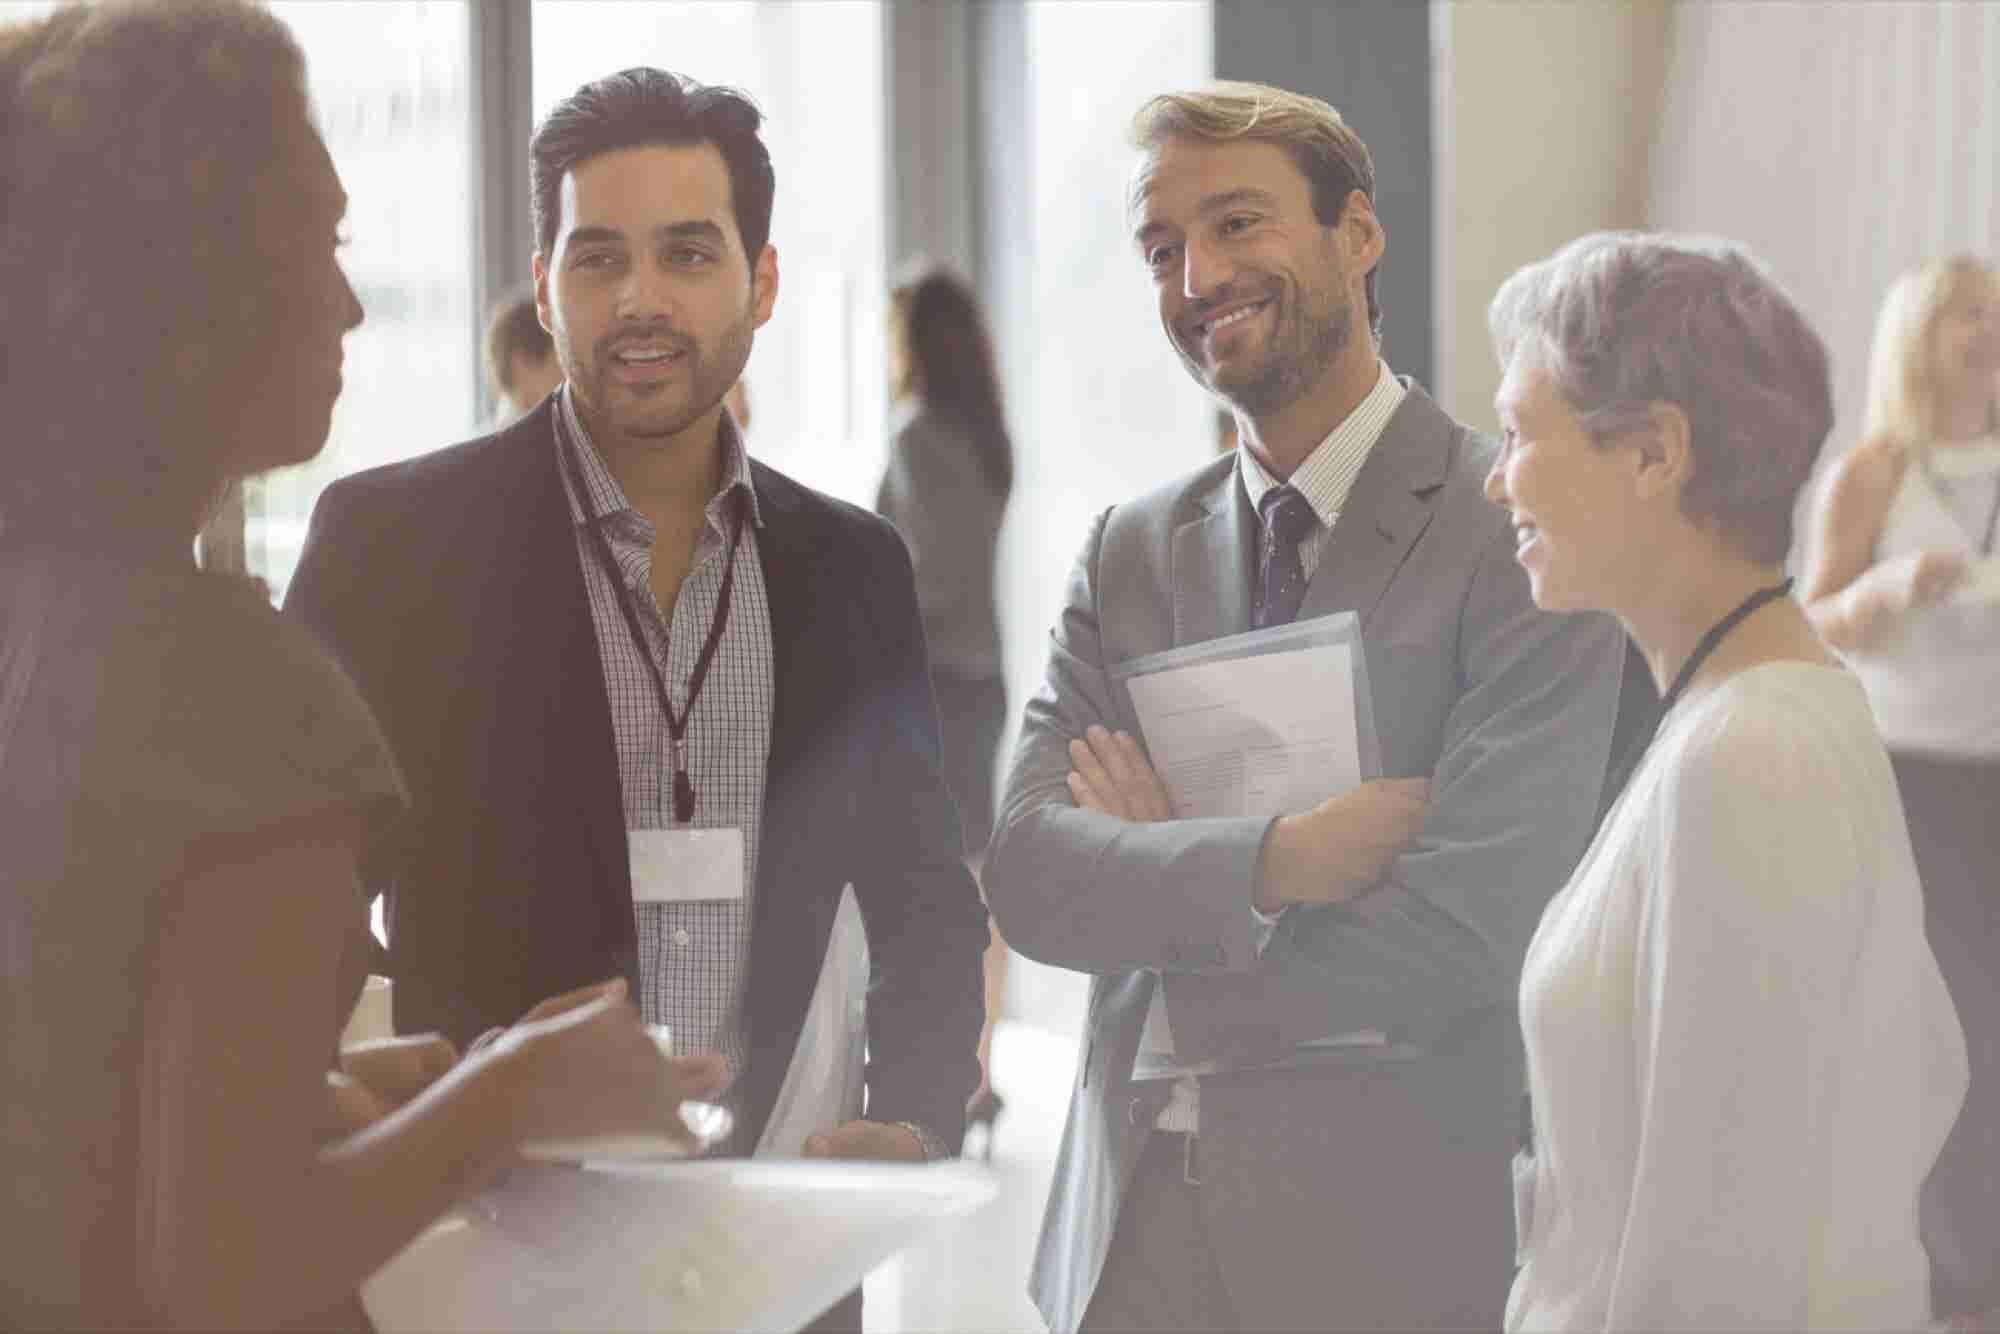 13 Simple Ways to Market Your Business Offline